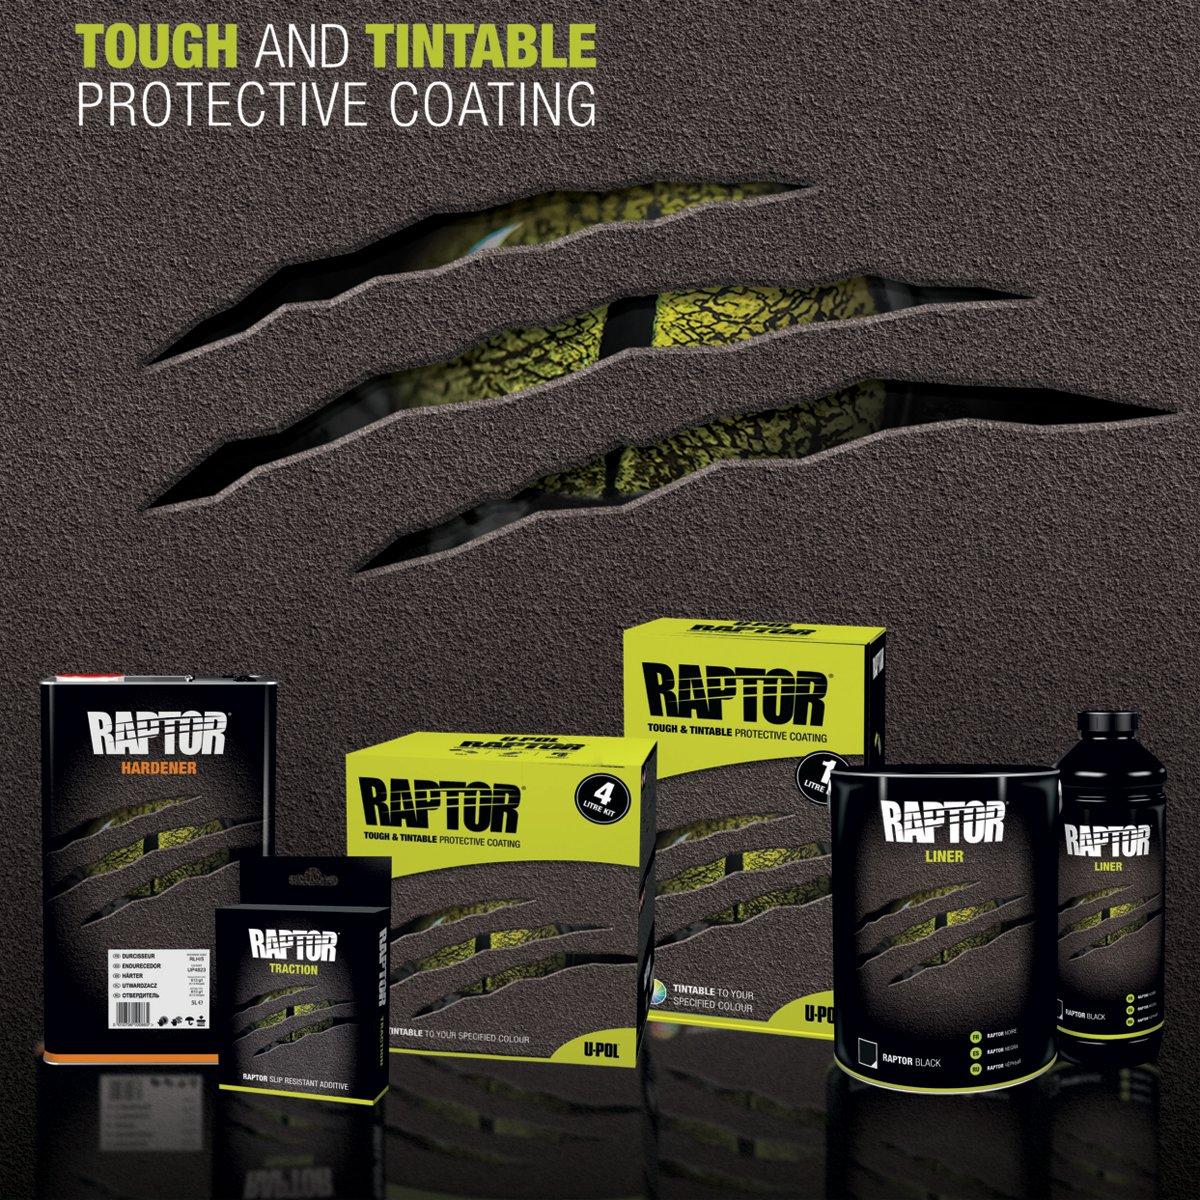 U-POL Raptor Tintable Urethane Spray-On Truck Bed Liner Kit w/ FREE Spray Gun, 8 Liters by U-Pol (Image #9)